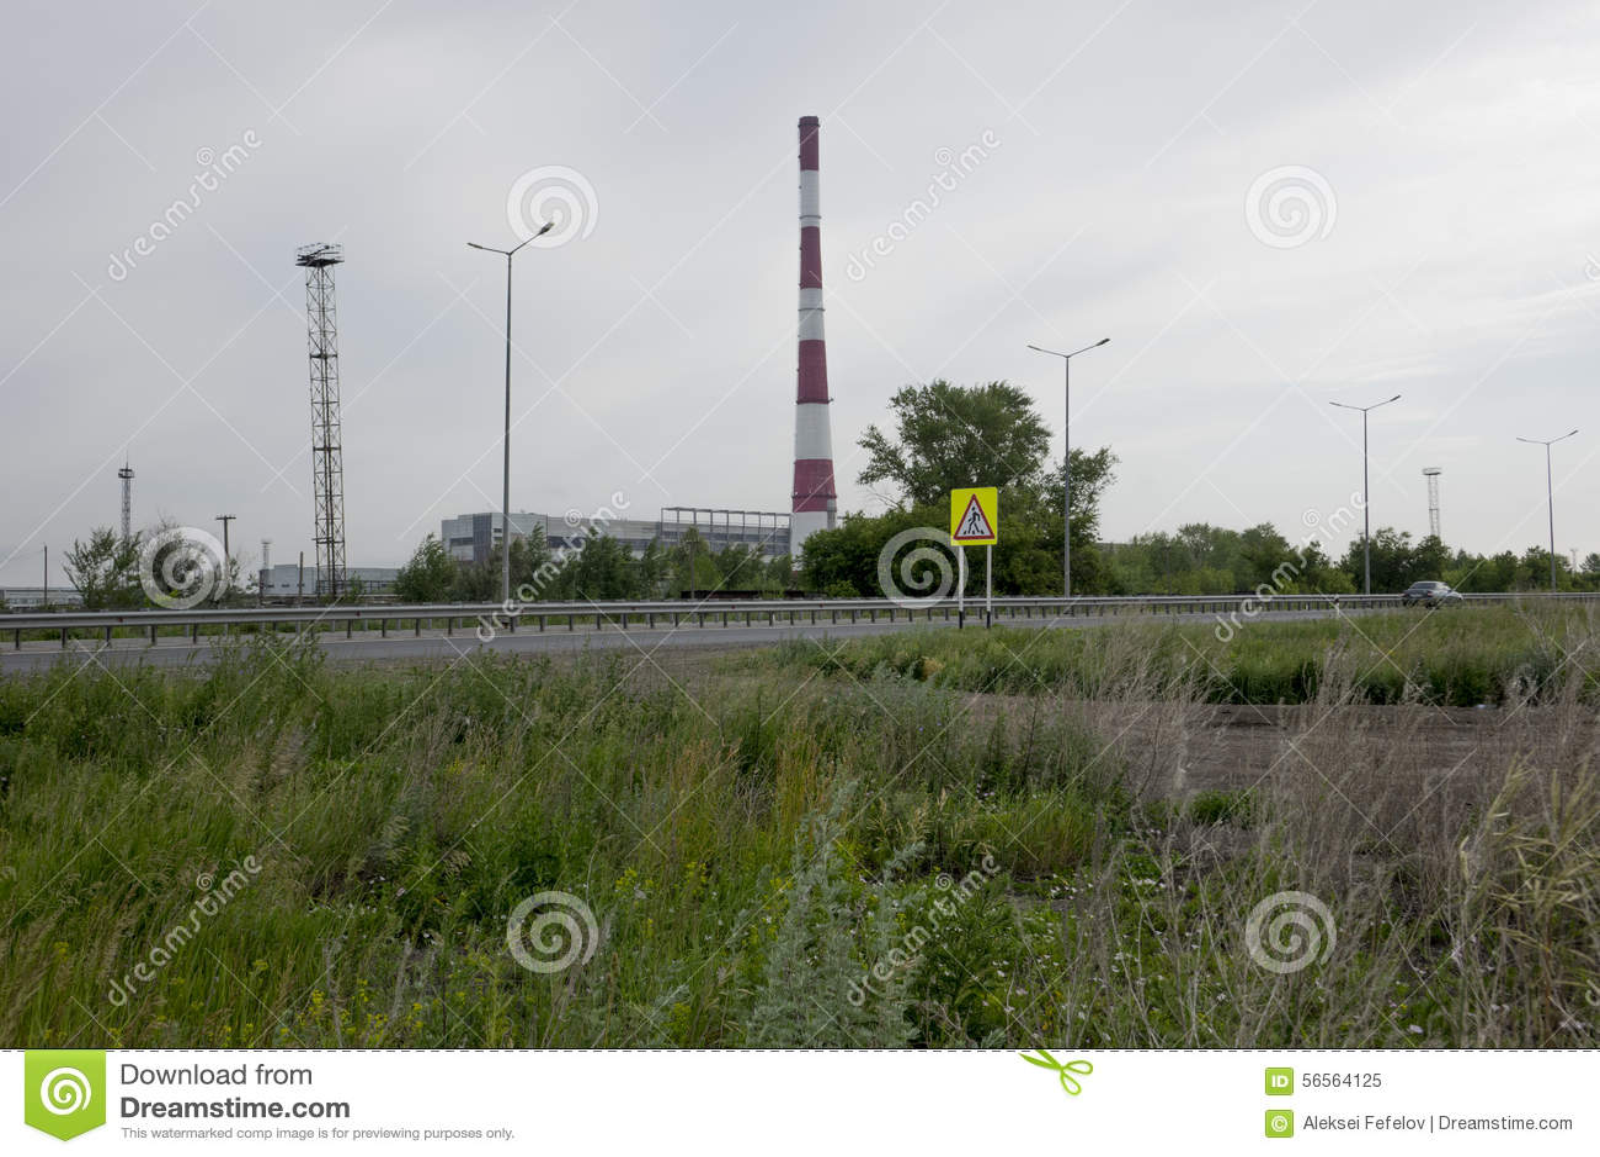 Download τα χρώματα κτηρίων αντιπαραβάλλουν υψηλό βιομηχανικό Στοκ Εικόνα - εικόνα από αγωγοί, ενότητες: 56564125